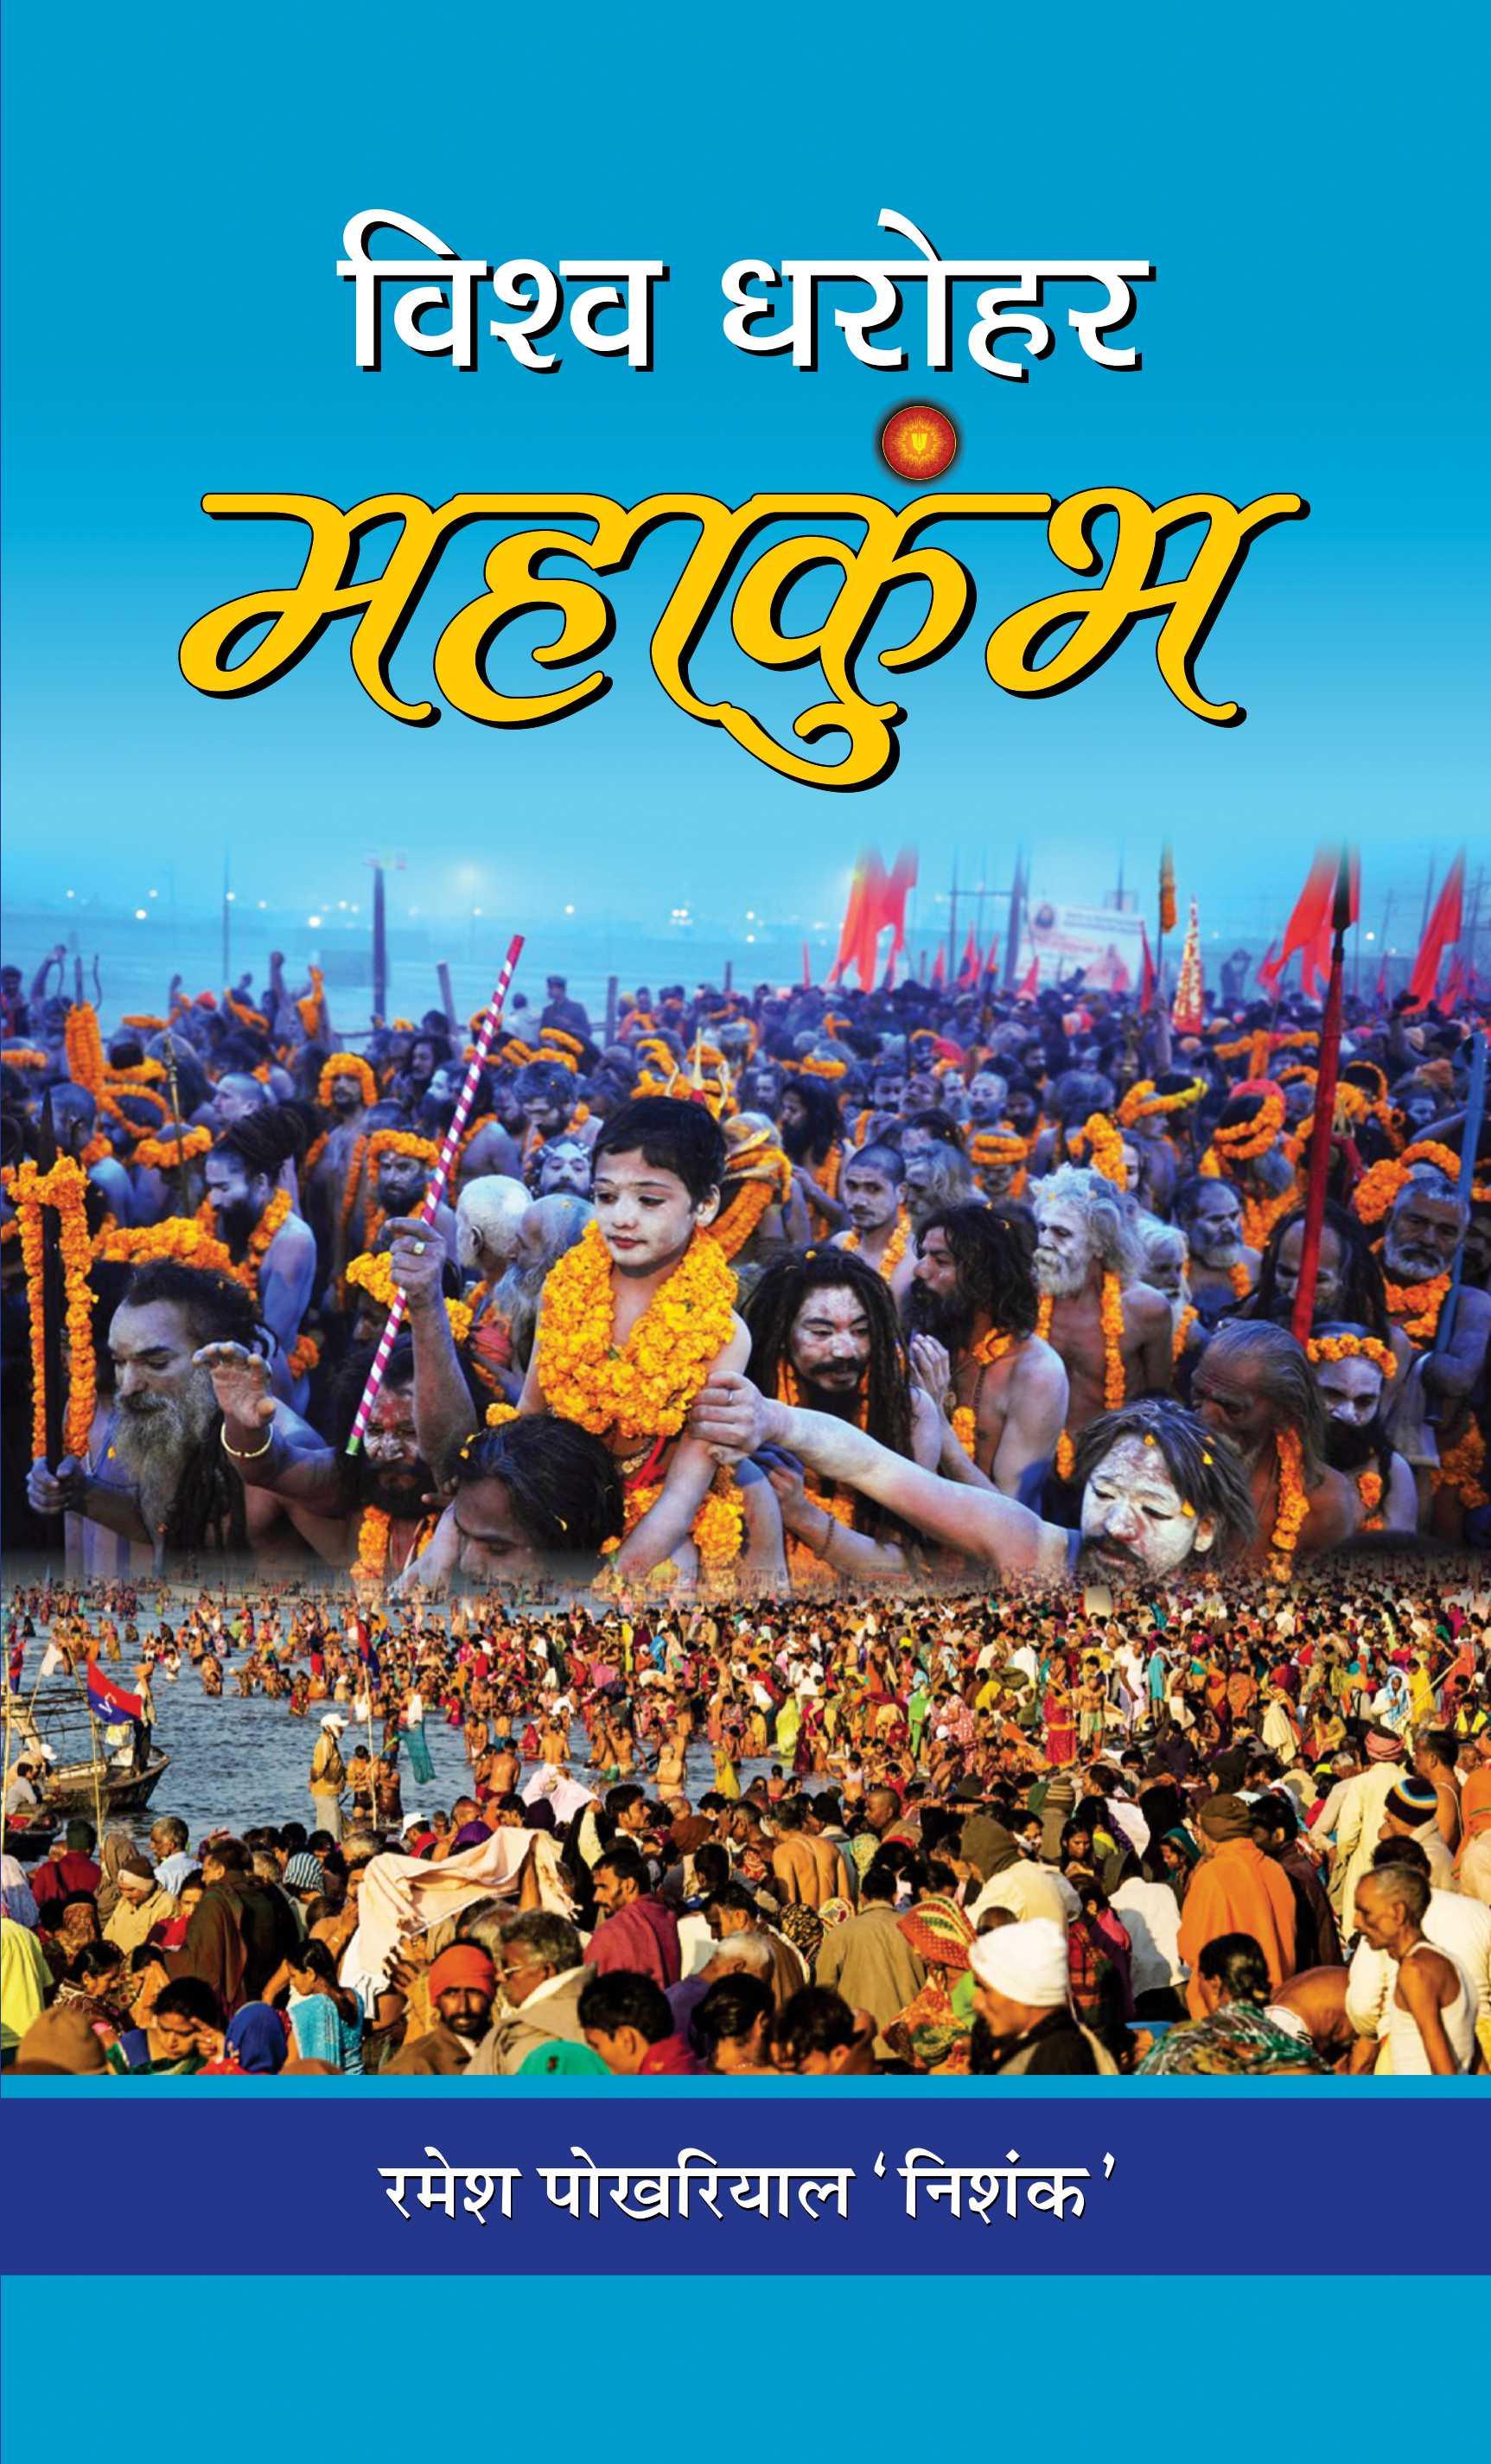 Vishwa Dharohar Mahakumbh